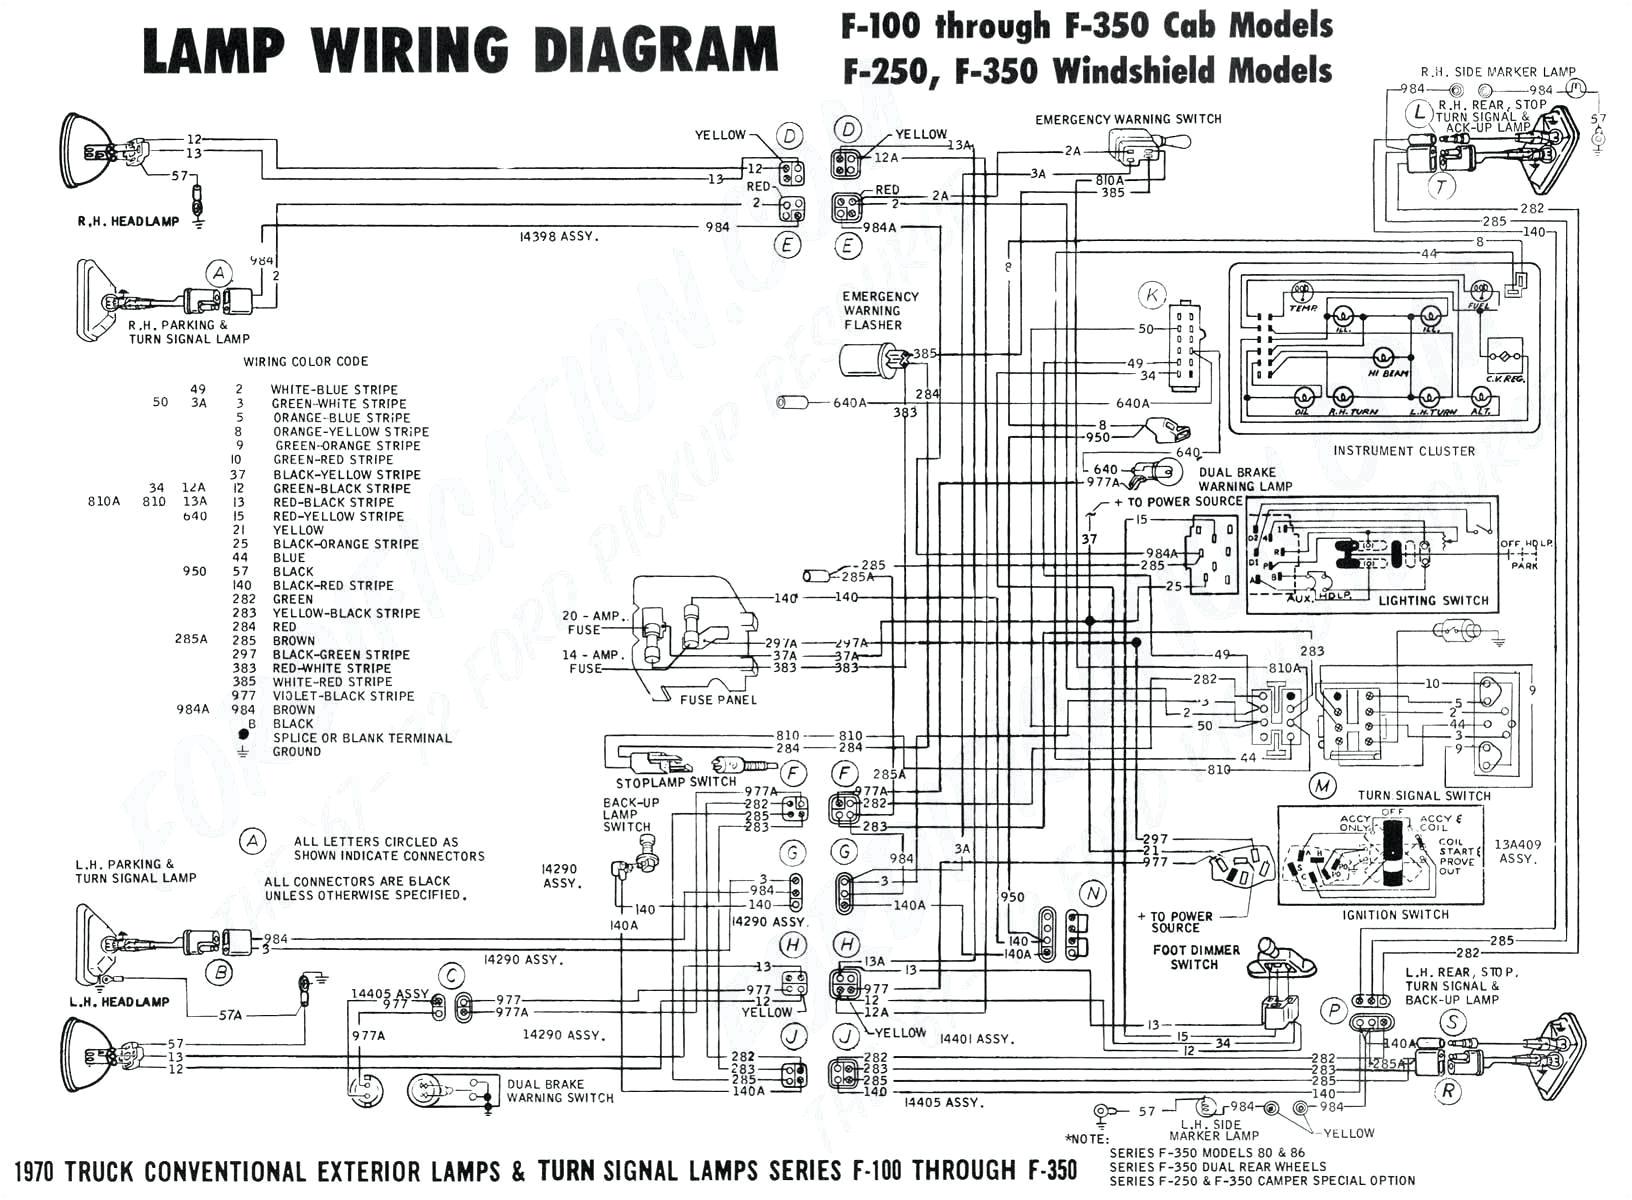 2005 jeep wrangler stereo wiring diagram luxury 1992 jeep wrangler audio wiring diagram explained wiring diagrams